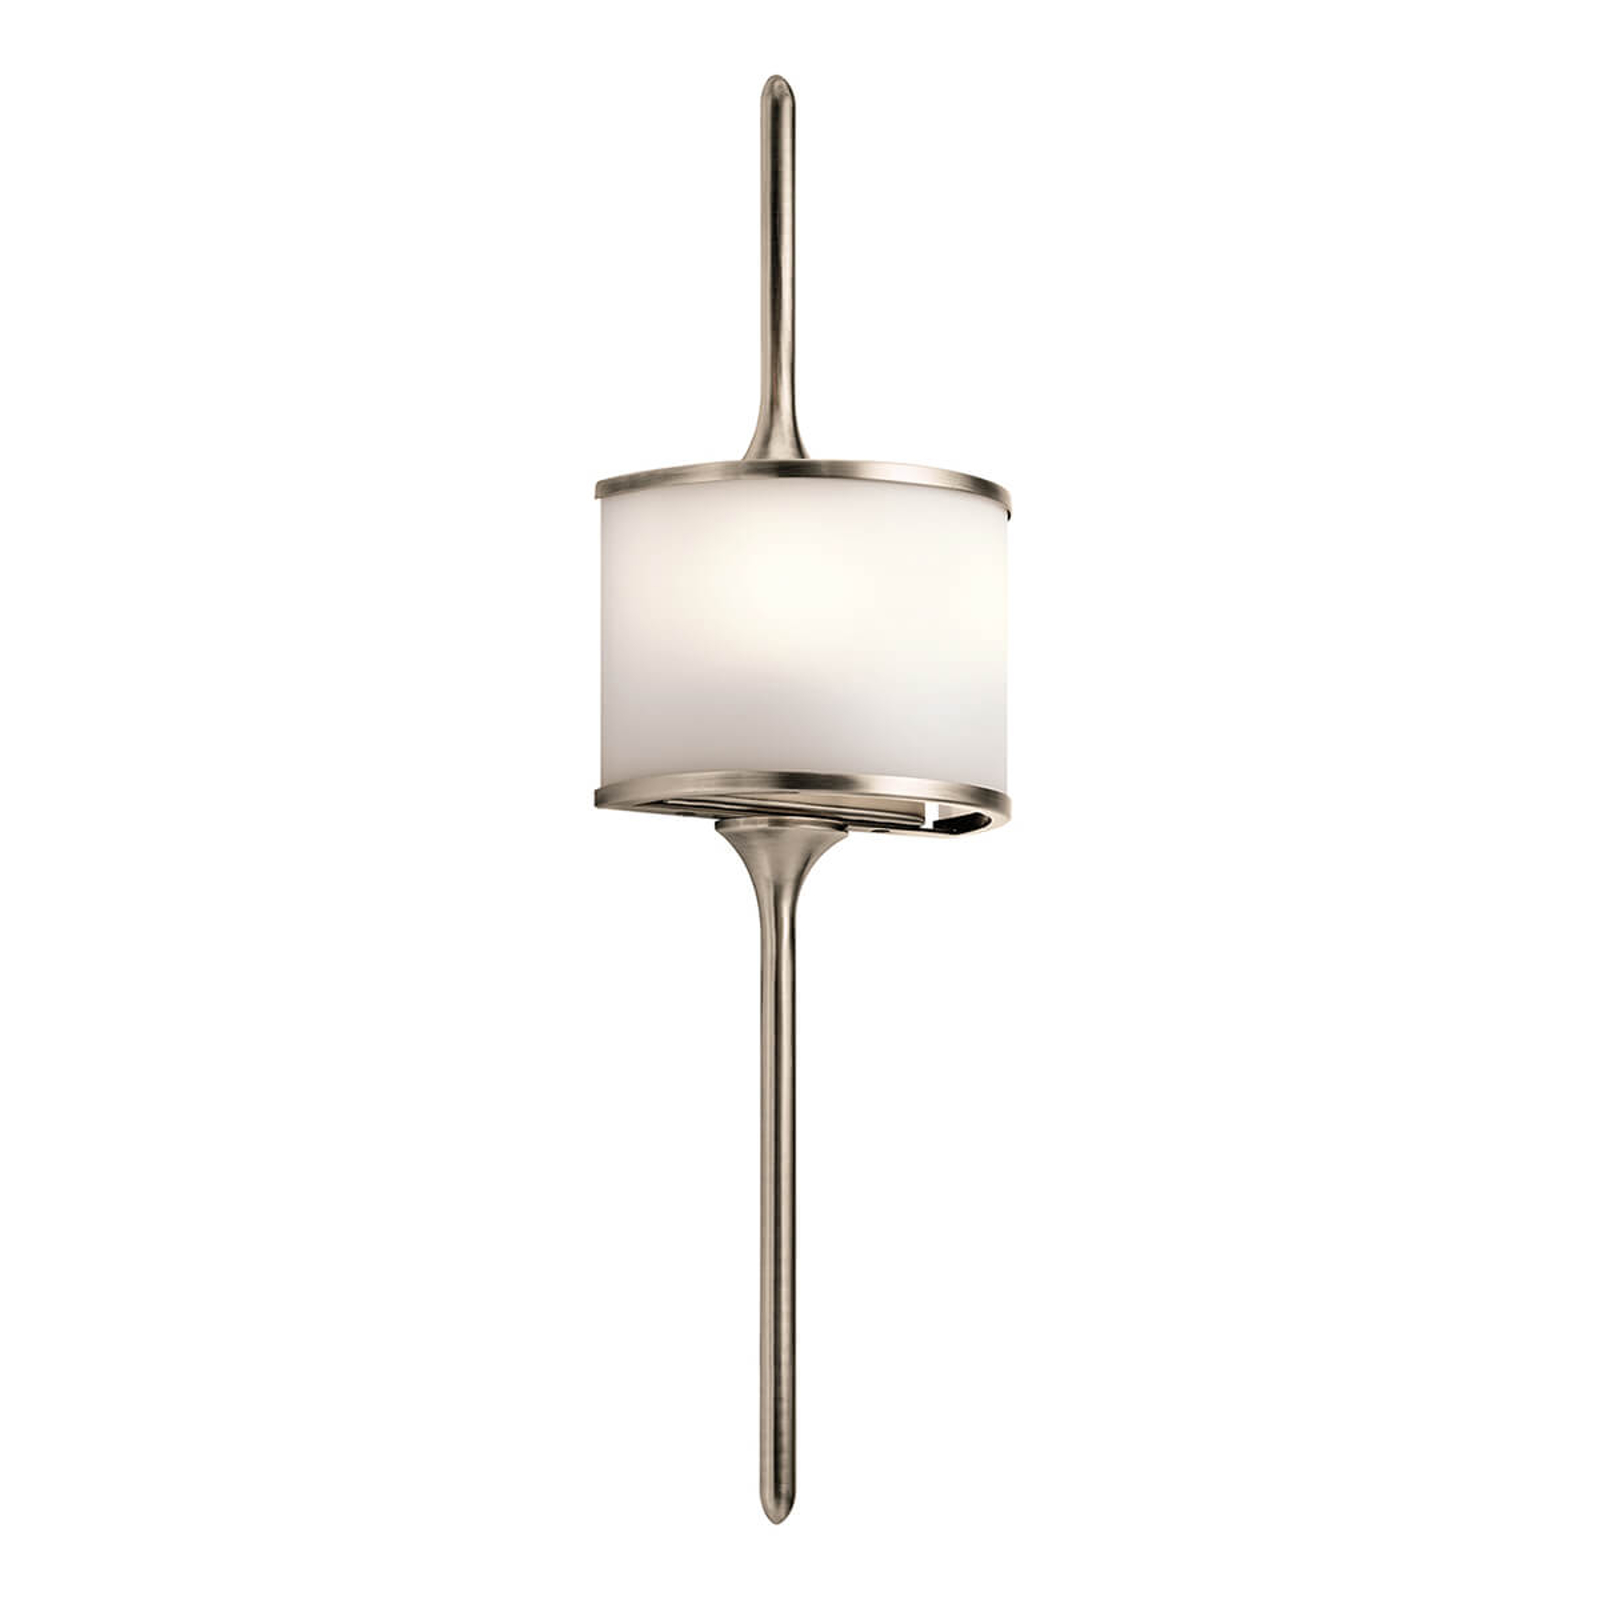 LED wandlamp Mona - hoogte 55,9 cm